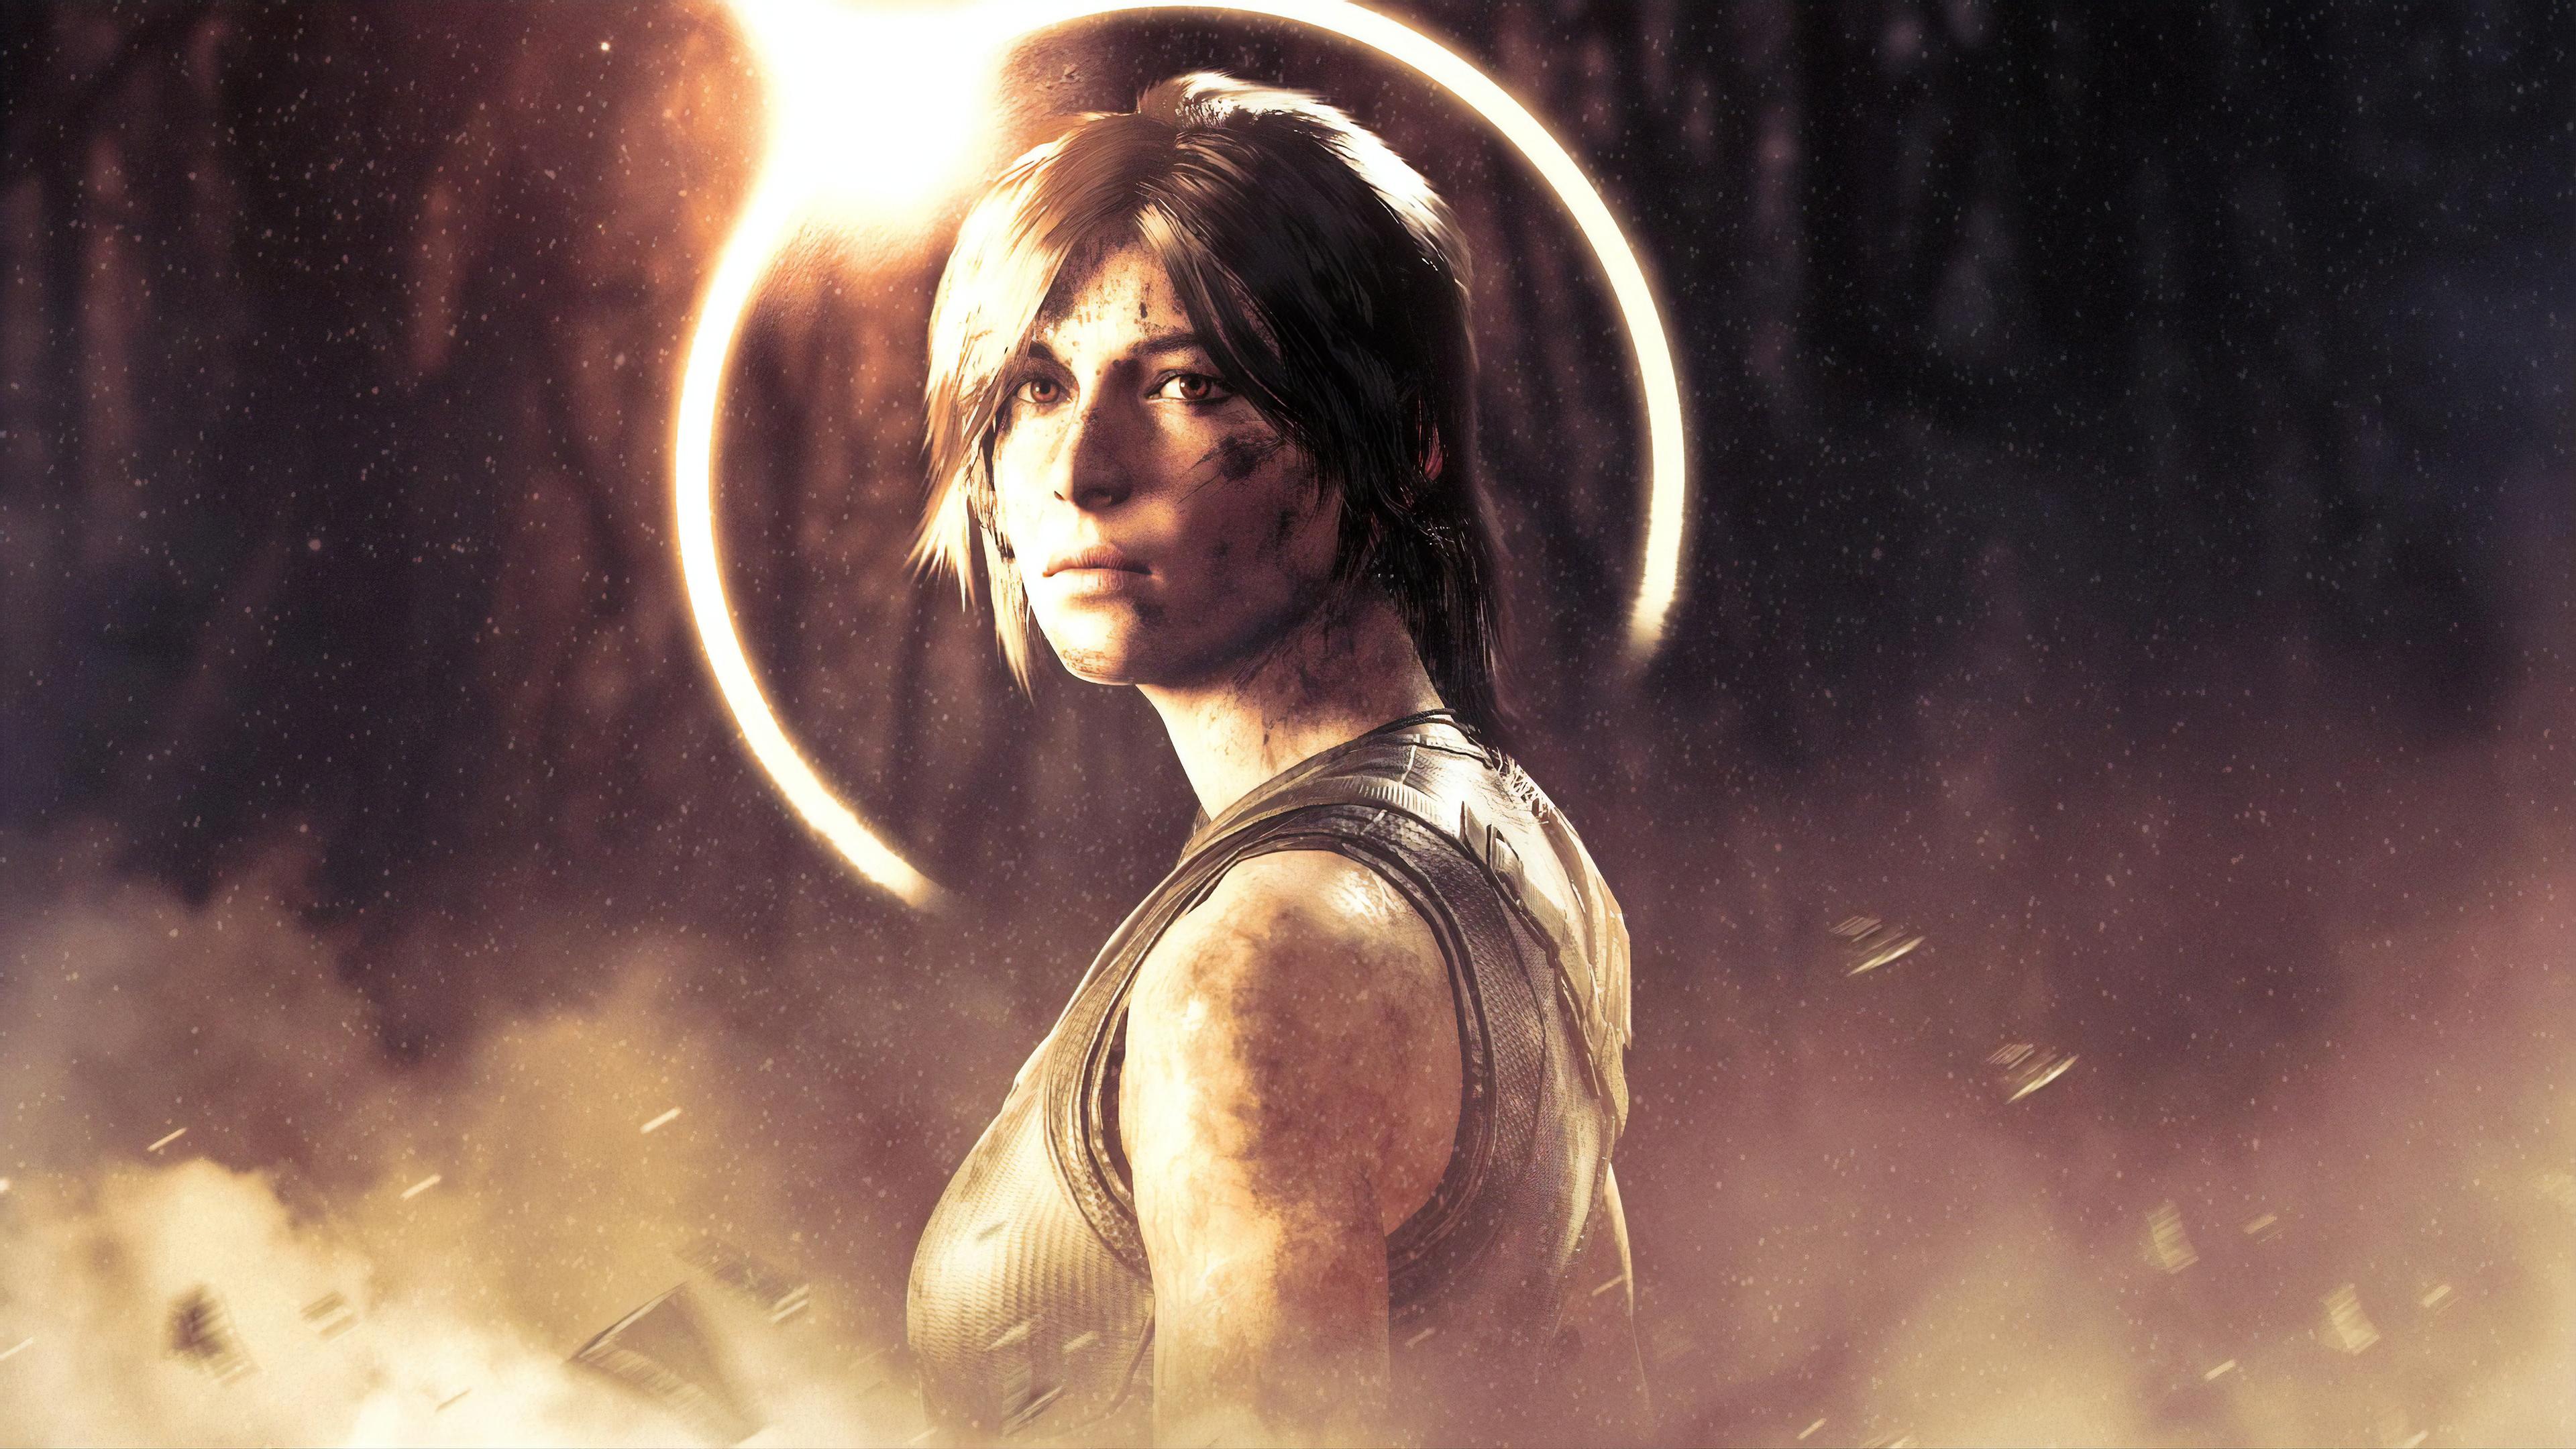 Wallpaper 4k Lara Croft From Shadow Of The Tomb Raider 2019 Games